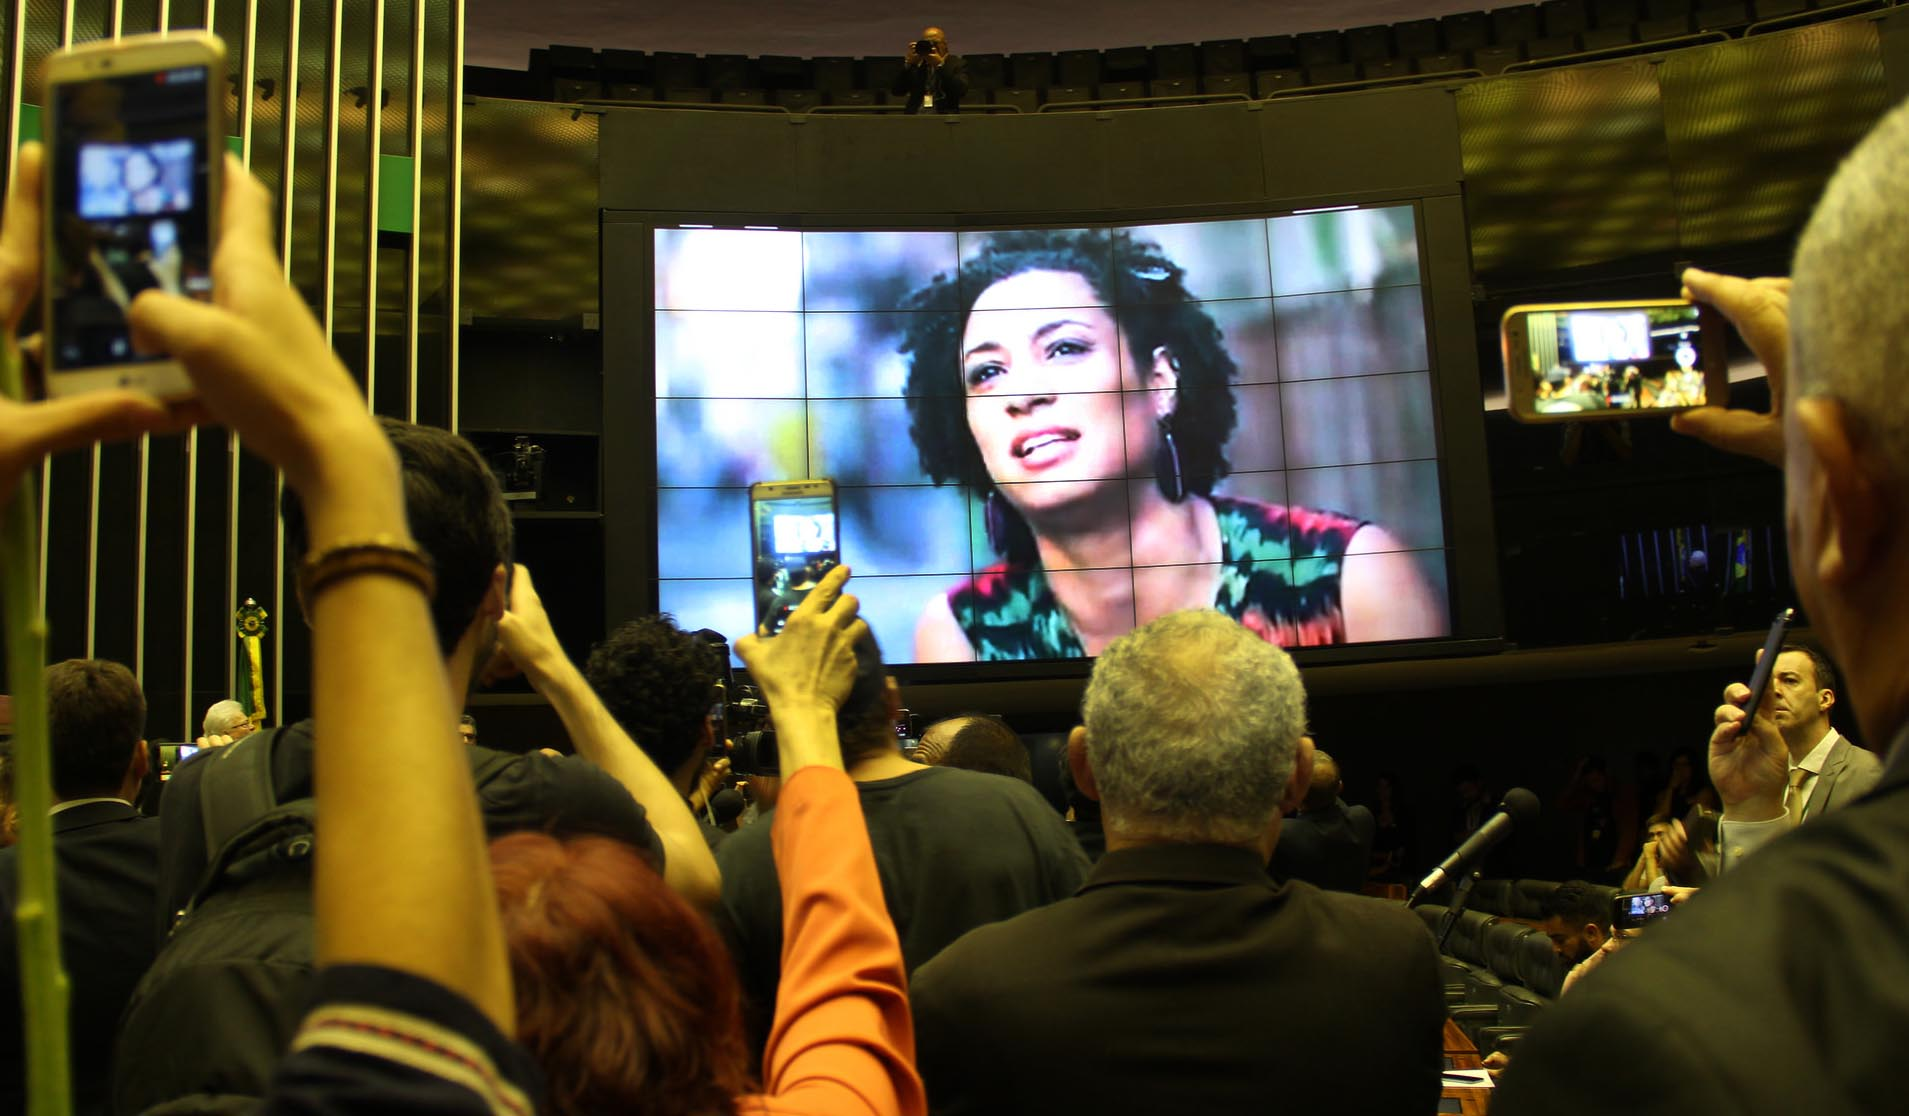 A morte de Marielle Franco e os Direitos Humanos no Brasil